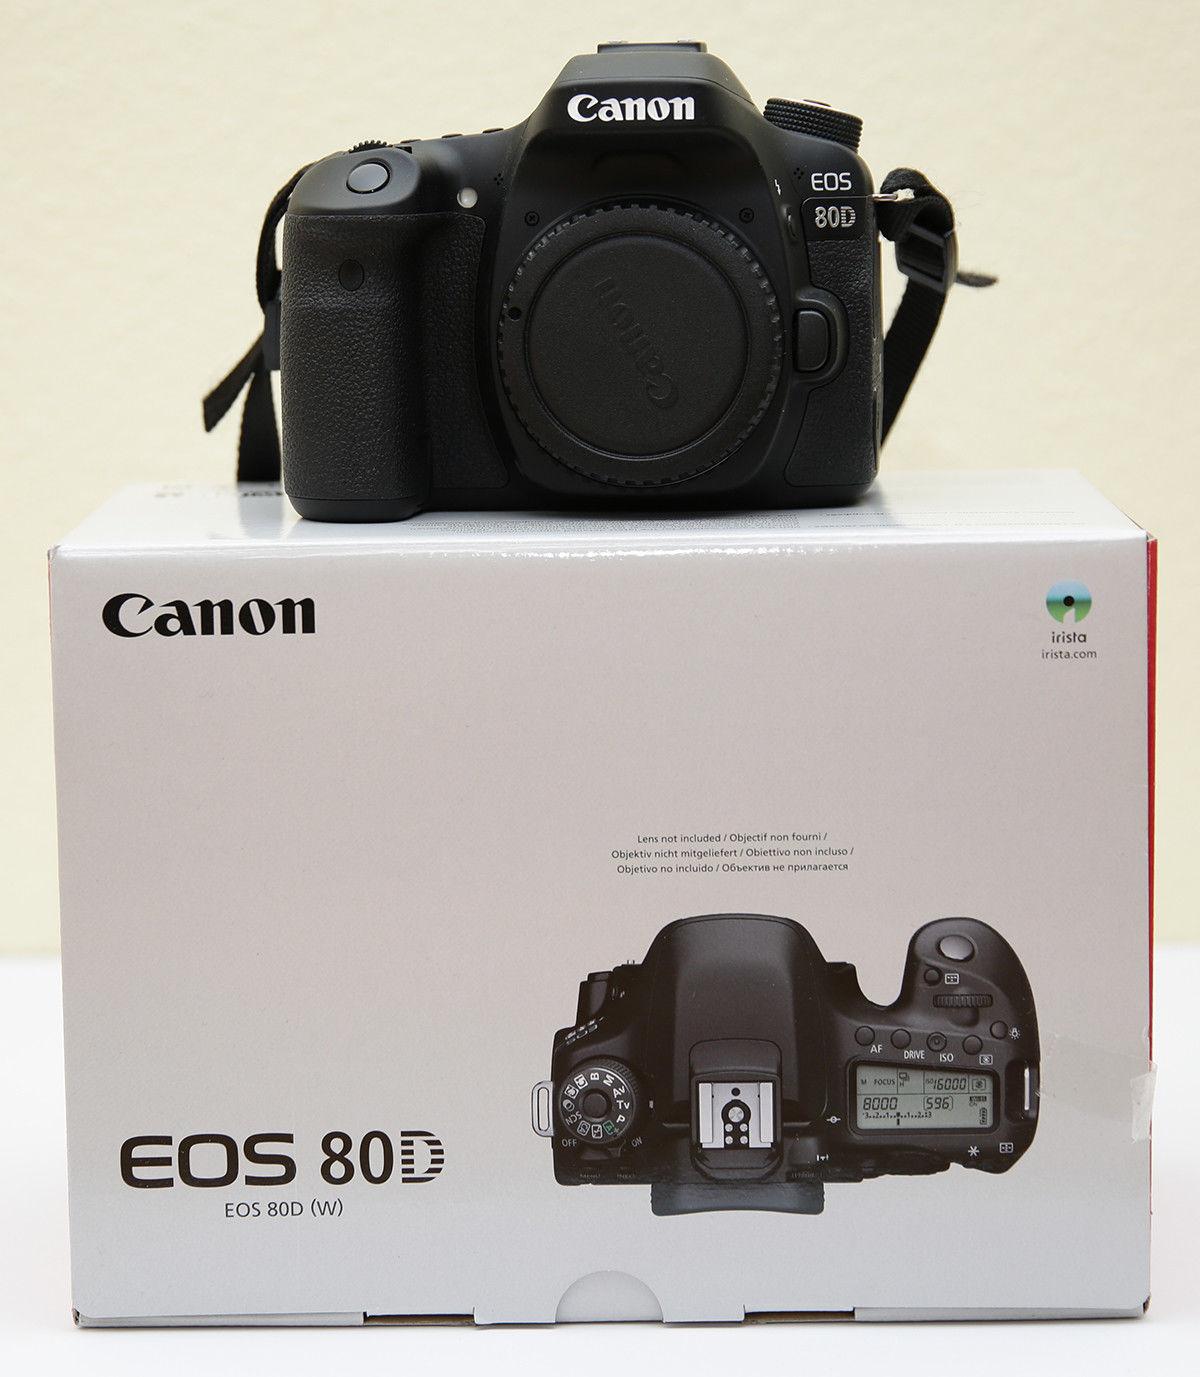 Canon EOS 80D 24.2 MP SLR-Digitalkamera - Top-Zustand!!! Kaum benutzt